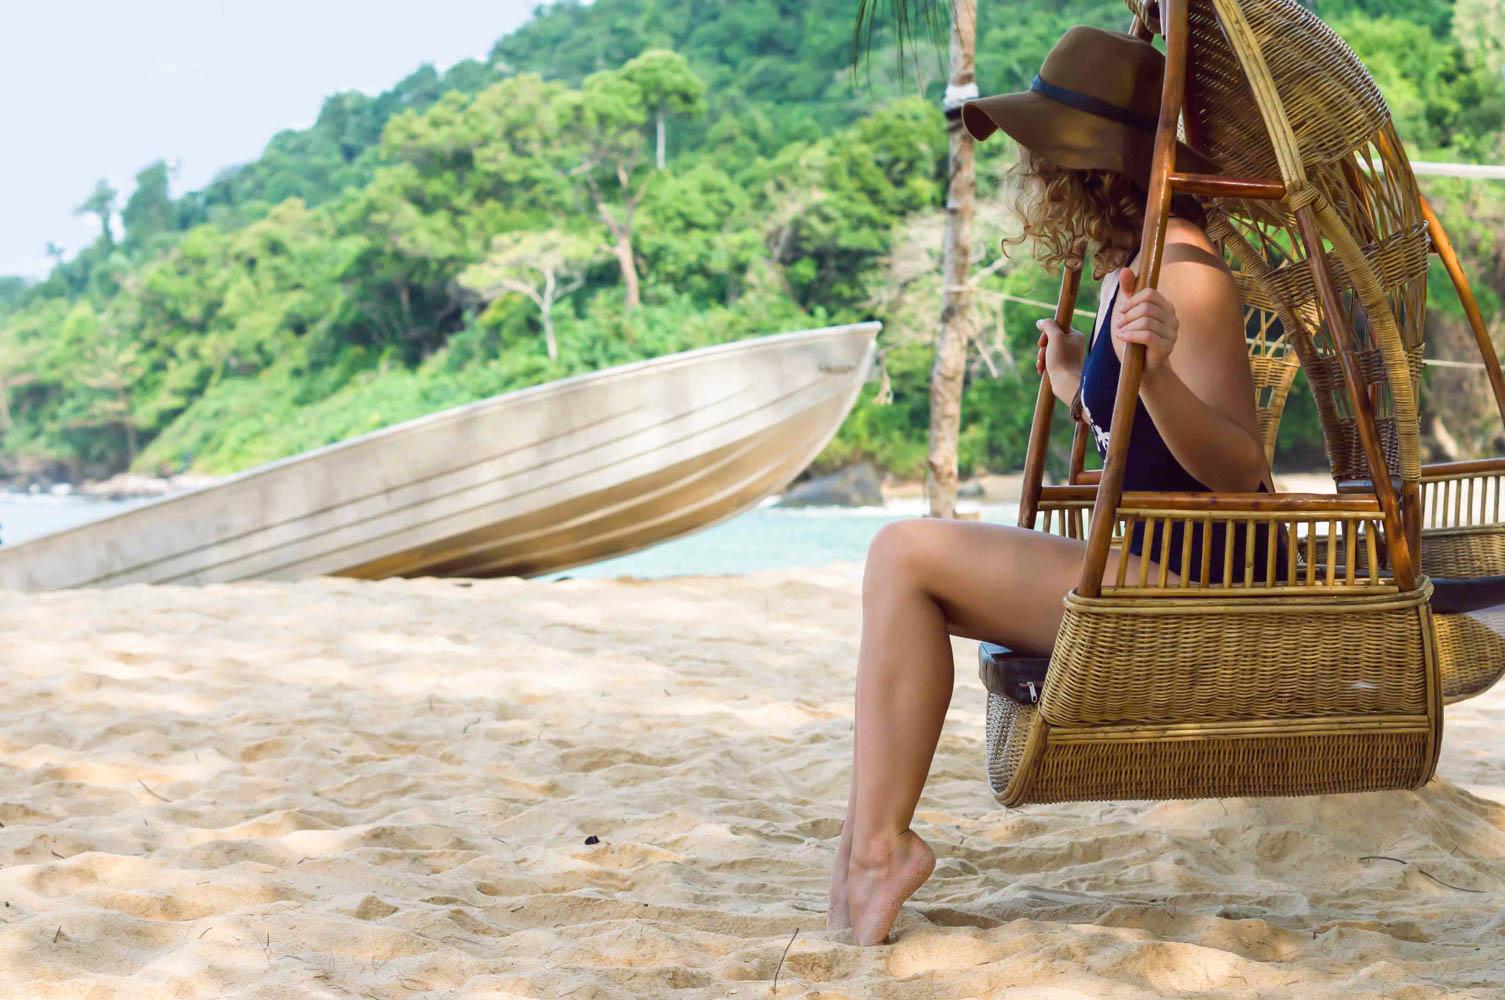 Chair swing on beach